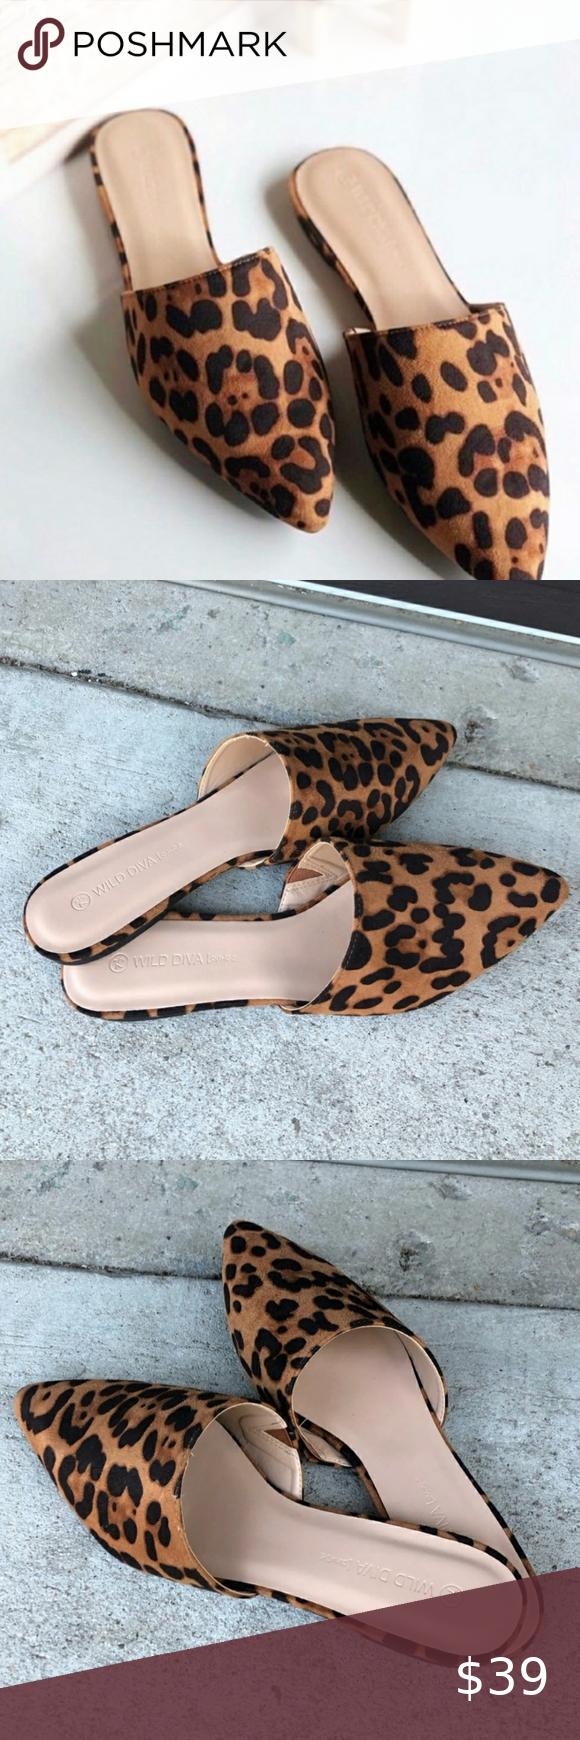 Wild diva shoes, Heels, Leopard mules